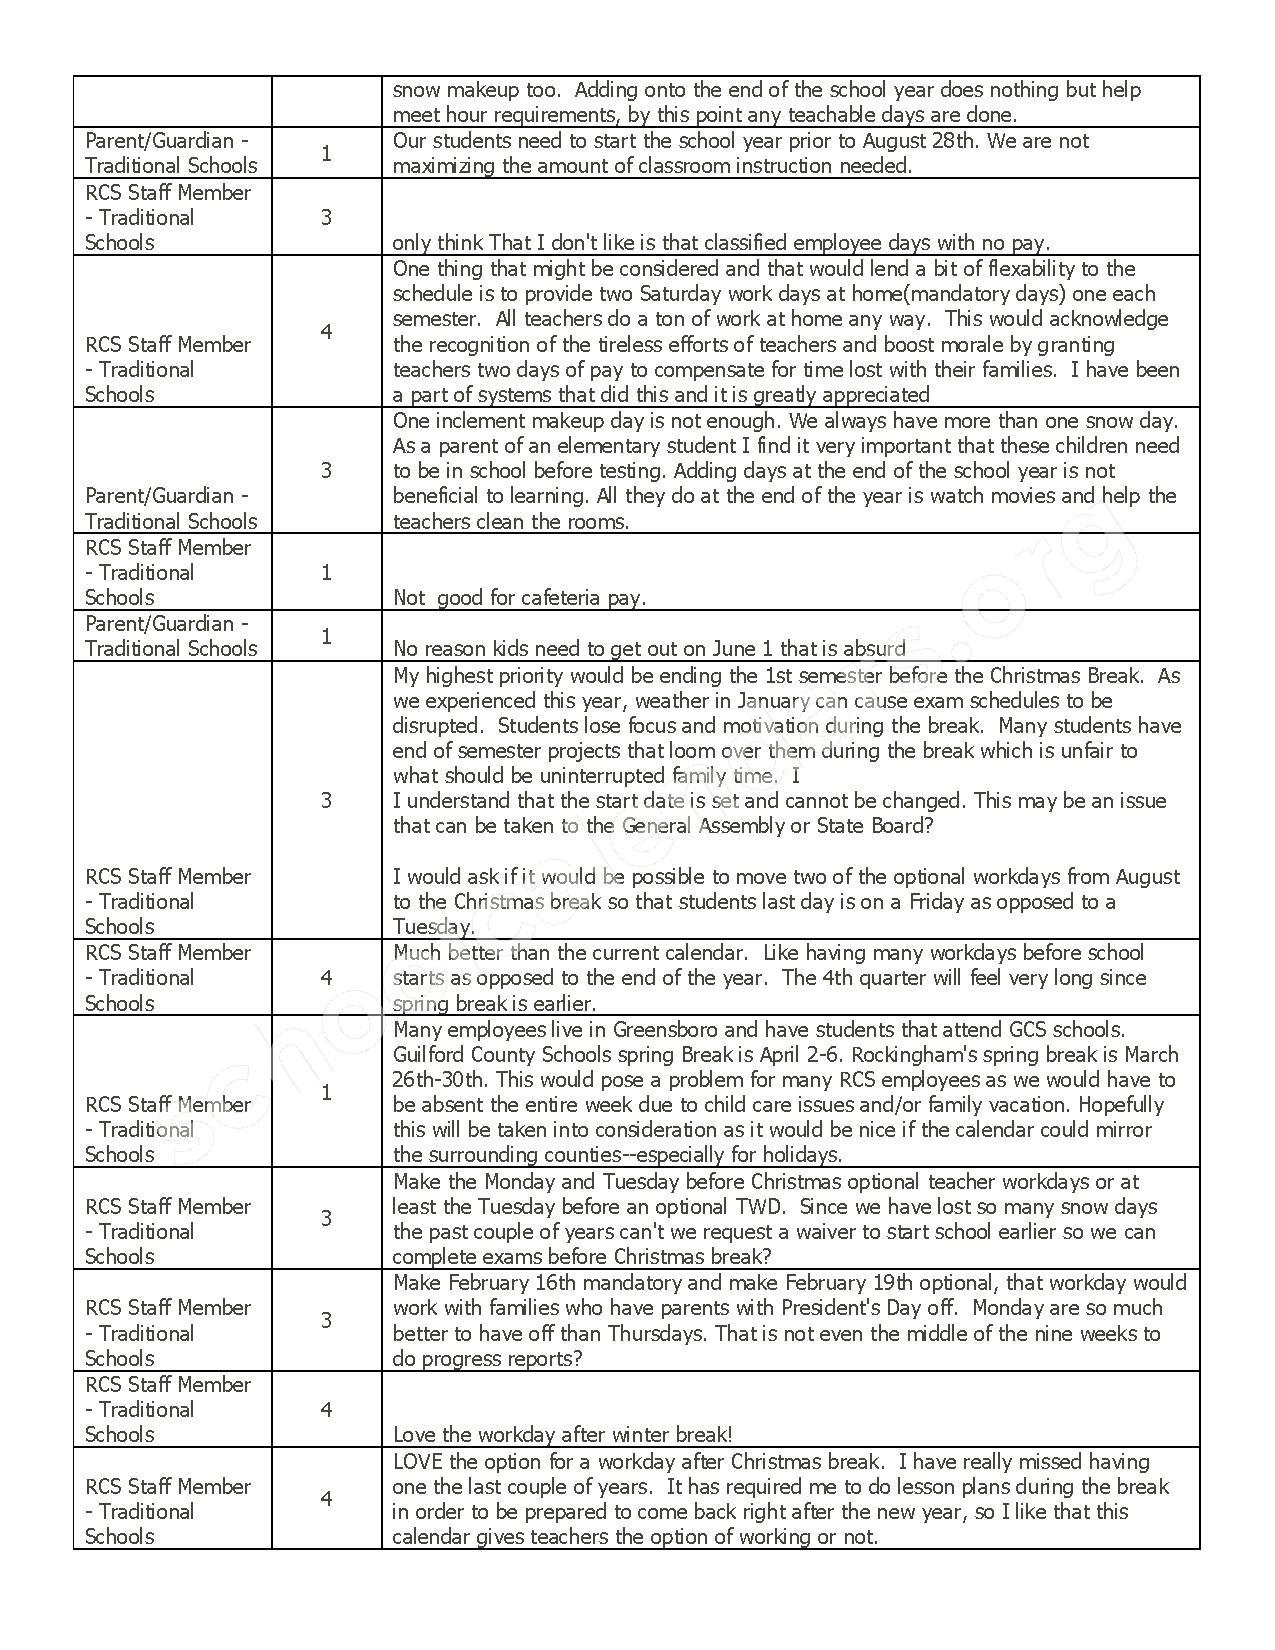 2017 - 2018 District Calendar – Rockingham County Schools – page 6